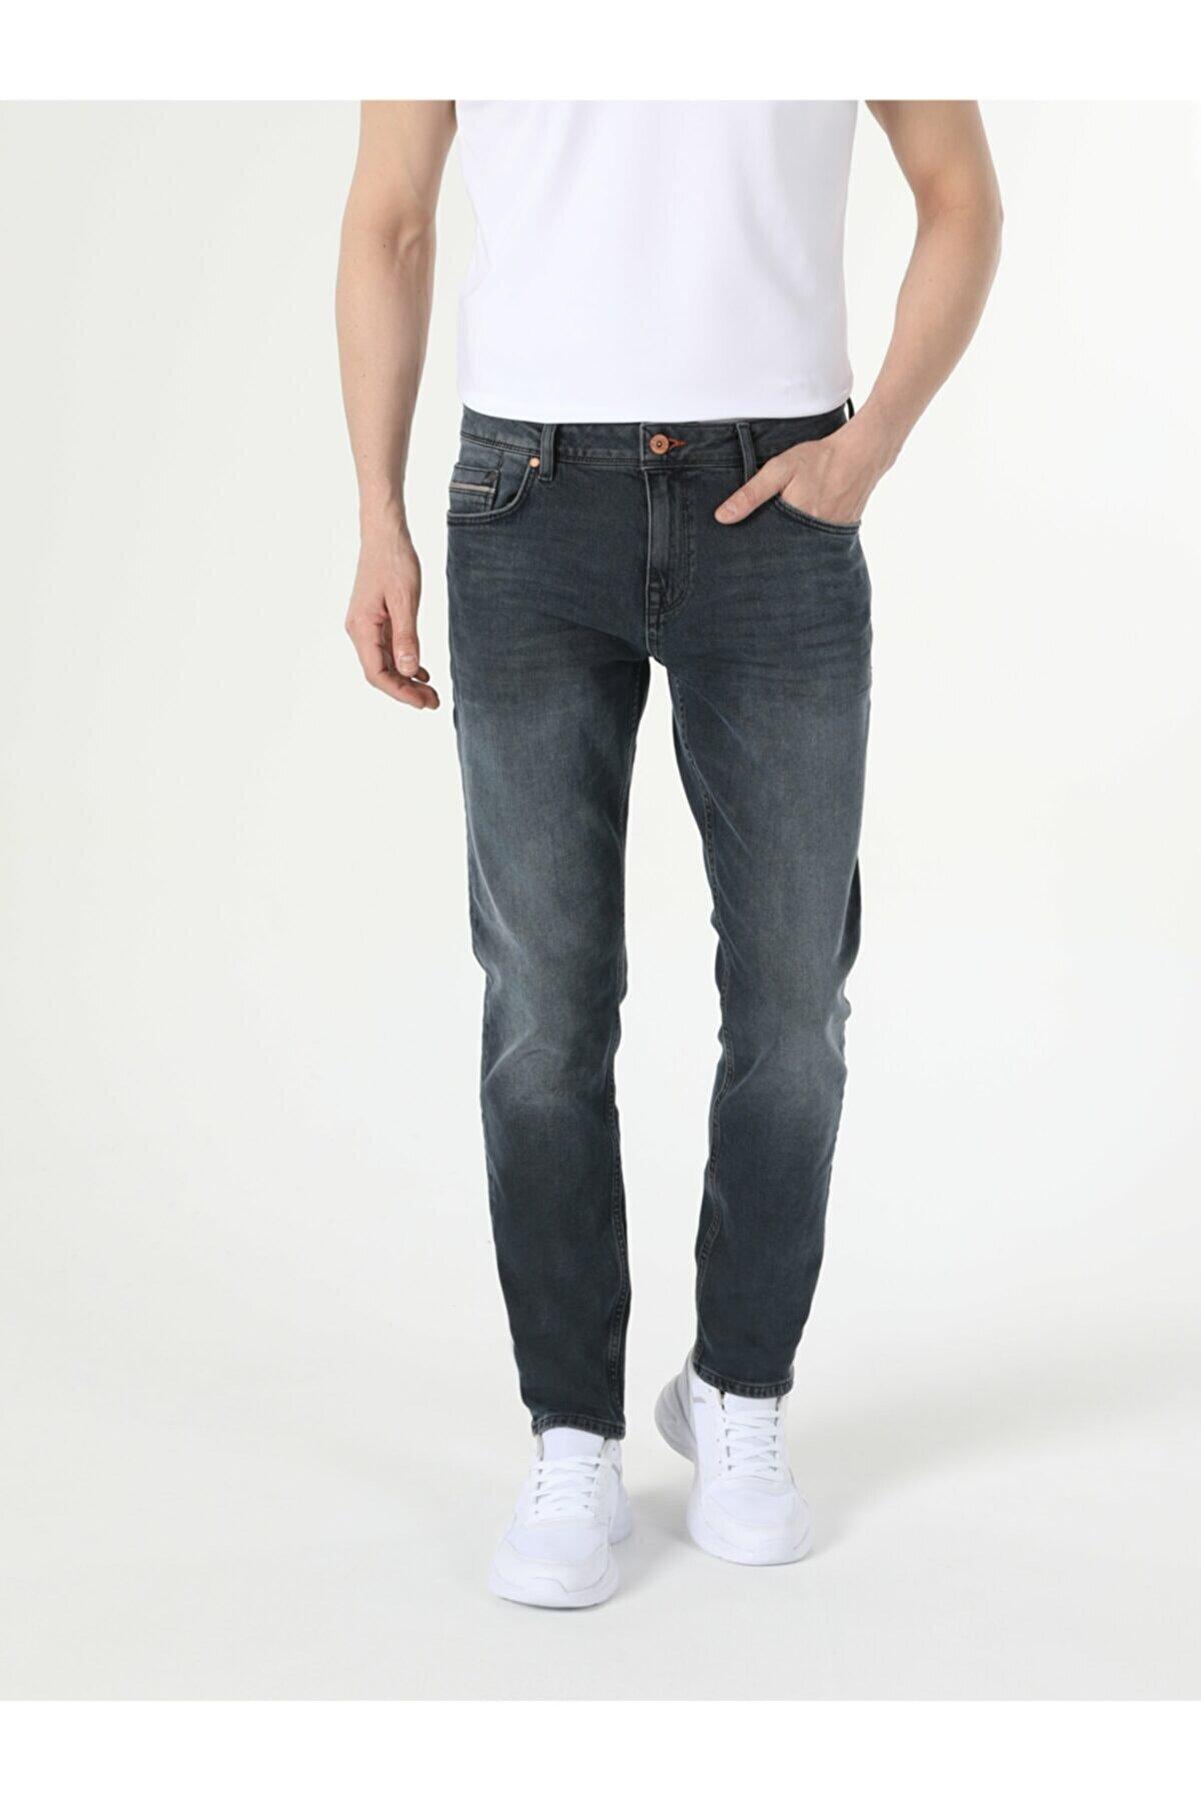 Colin's Karl Düşük Bel Düz Paça Straight Fit Jean Erkek Jean Pantolon